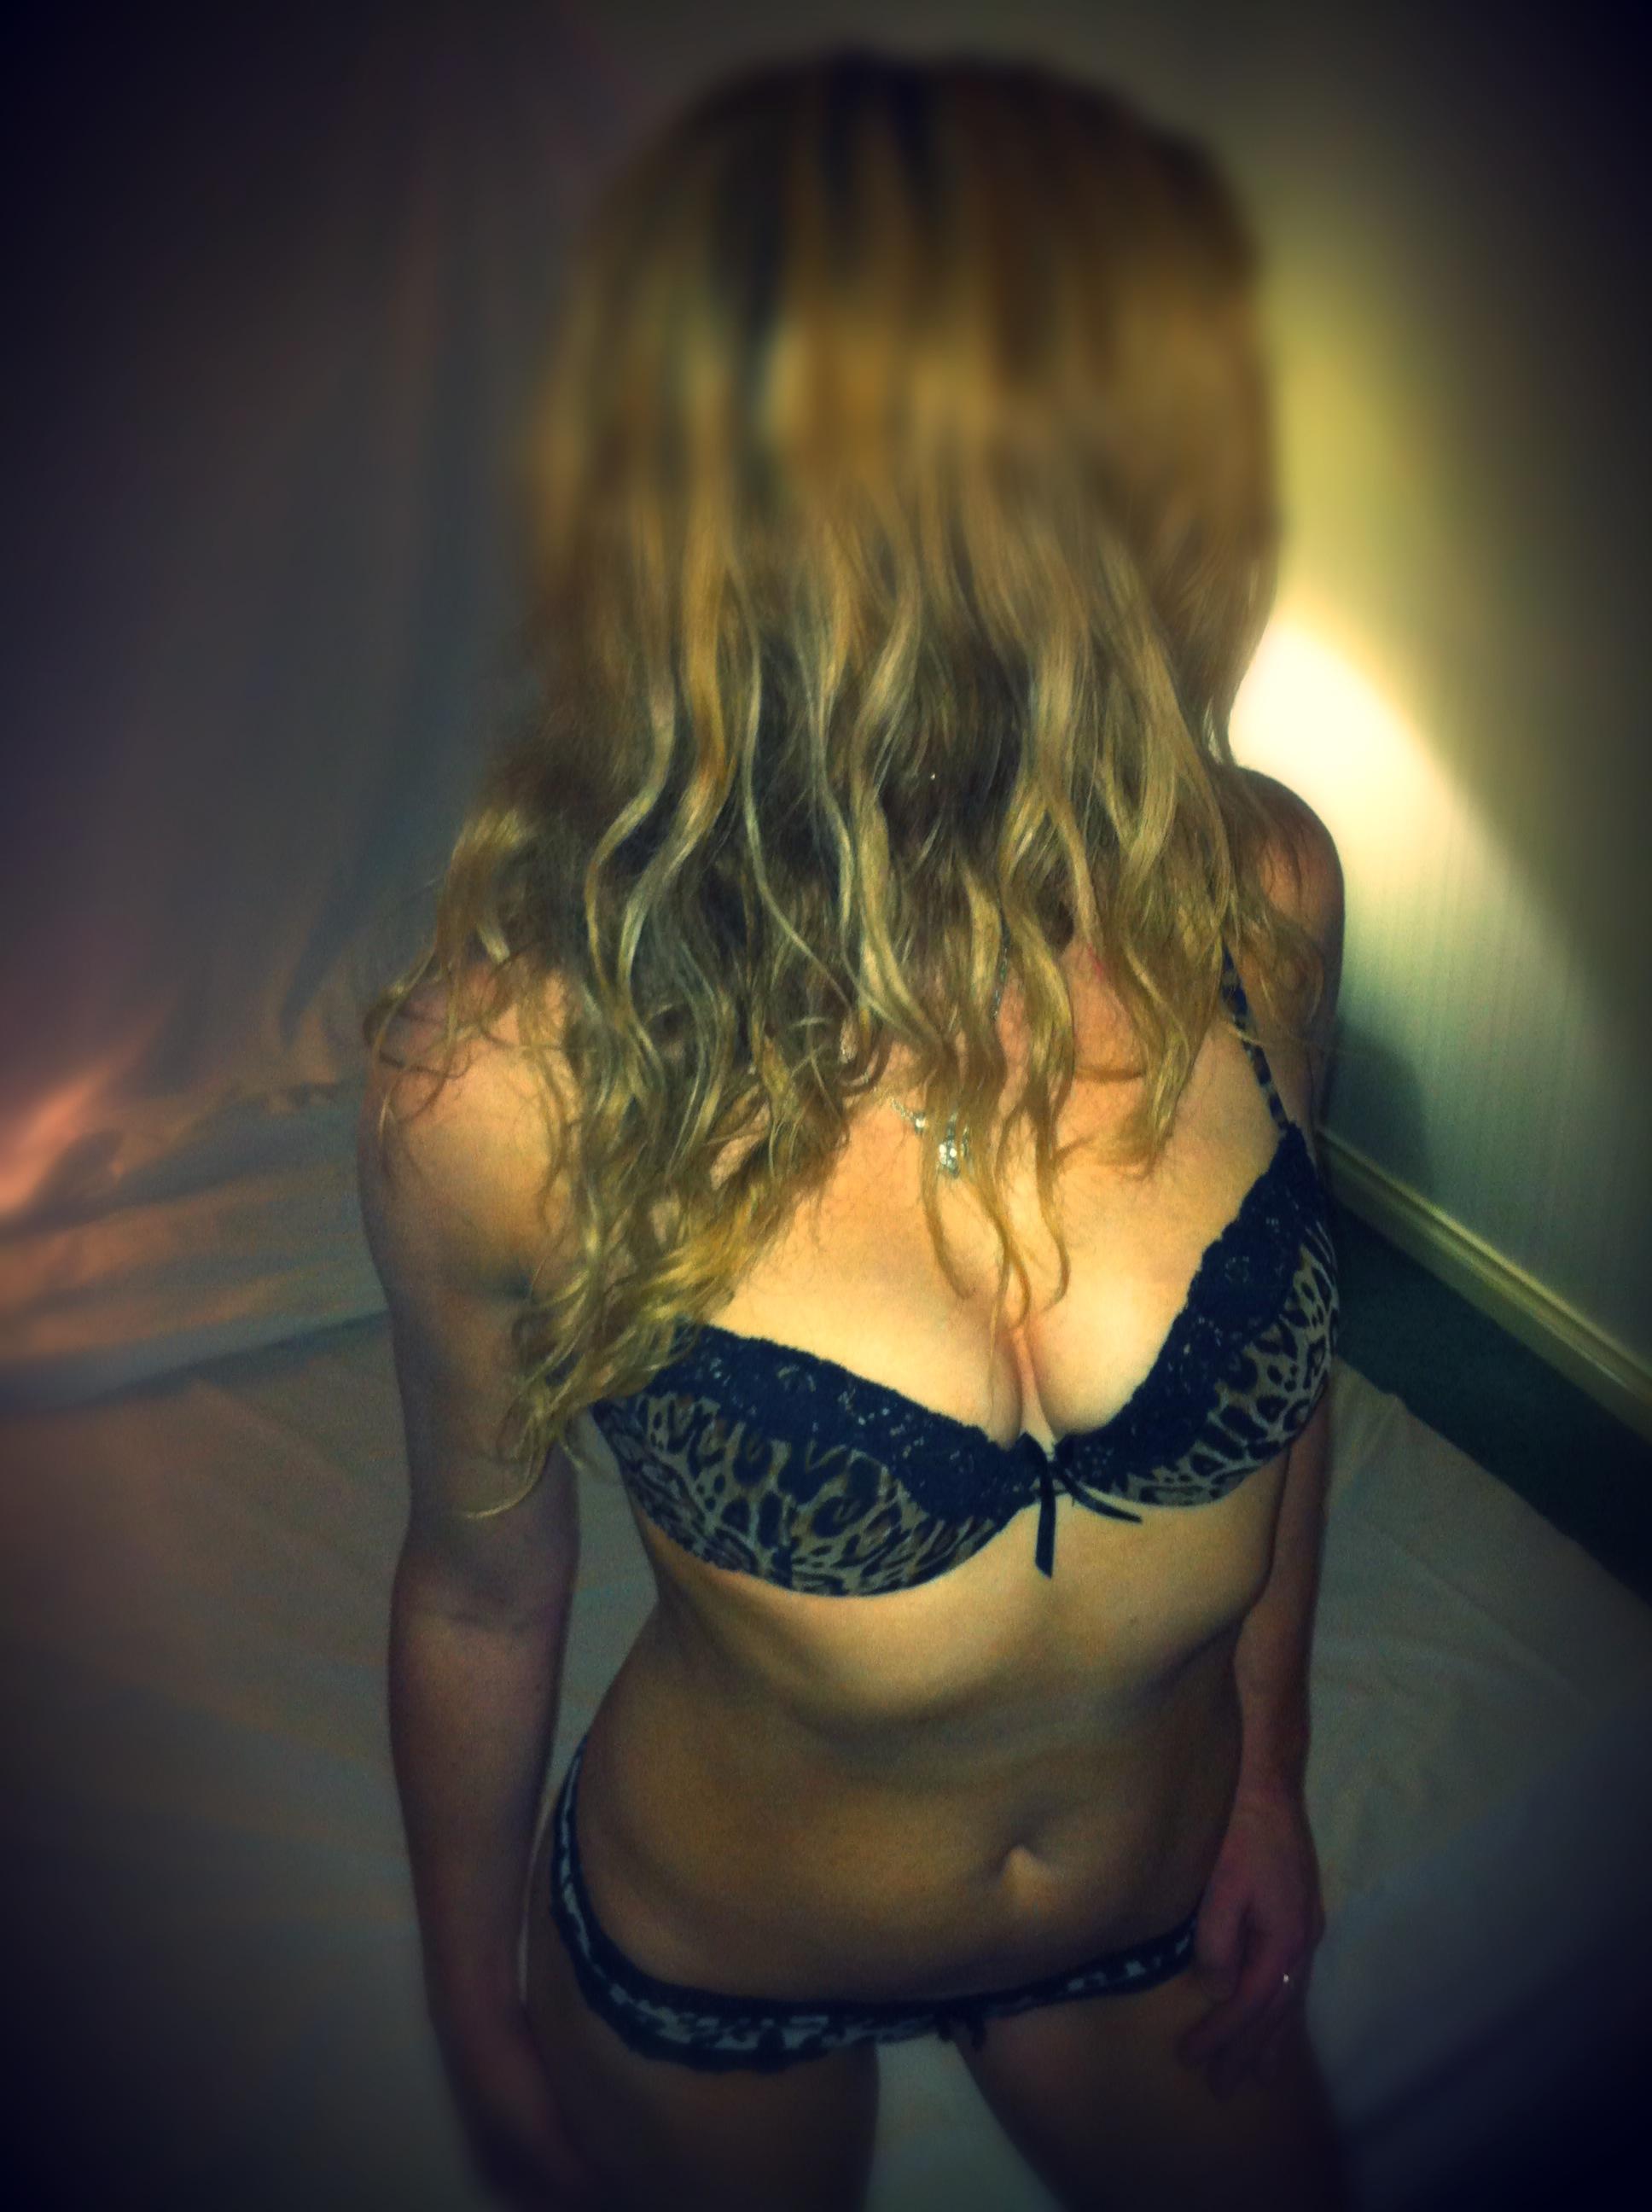 Tumblr - recopilacin de parejas amateur - Sexo para parejas